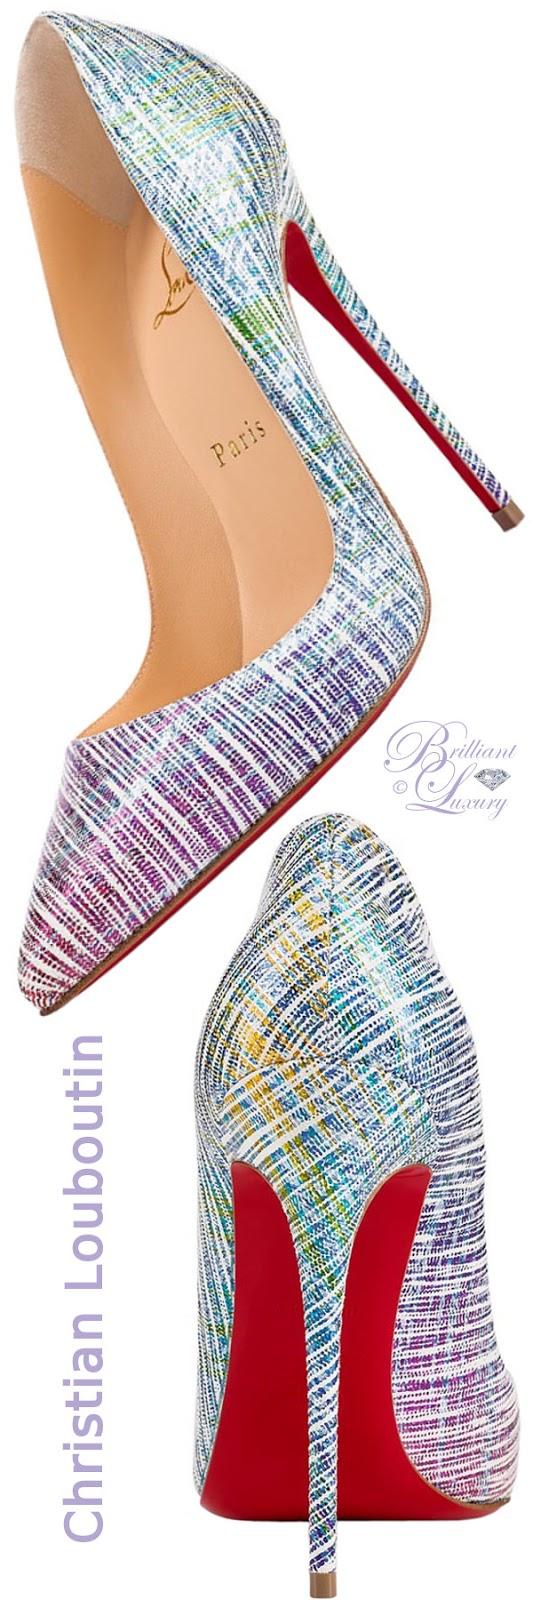 Brilliant Luxury ♦ Christian Louboutin So Kate pointed-toe superfine stiletto heels in pointillistic rainbow-print 'unicorn'